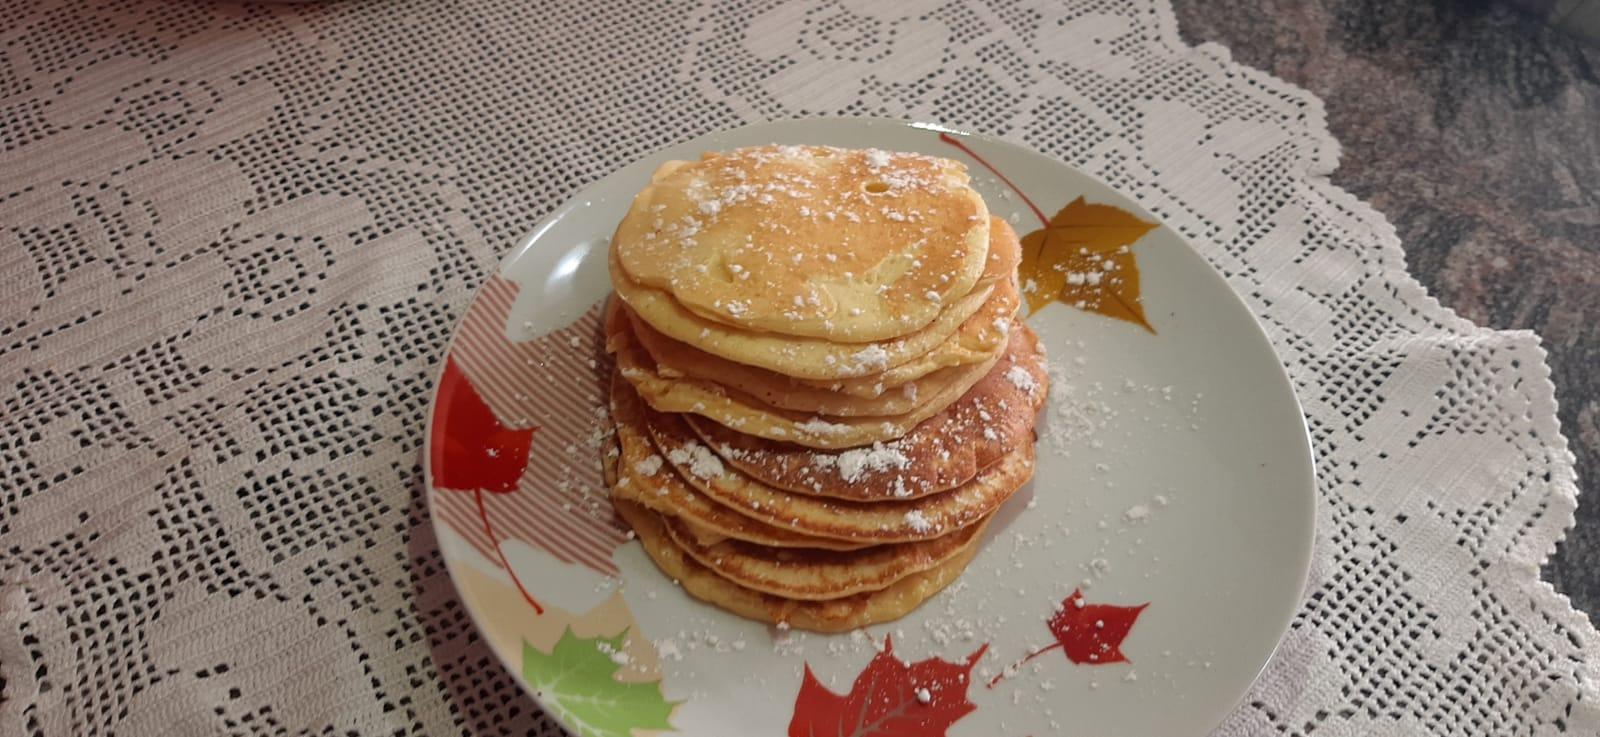 Pancake ricetta semplice